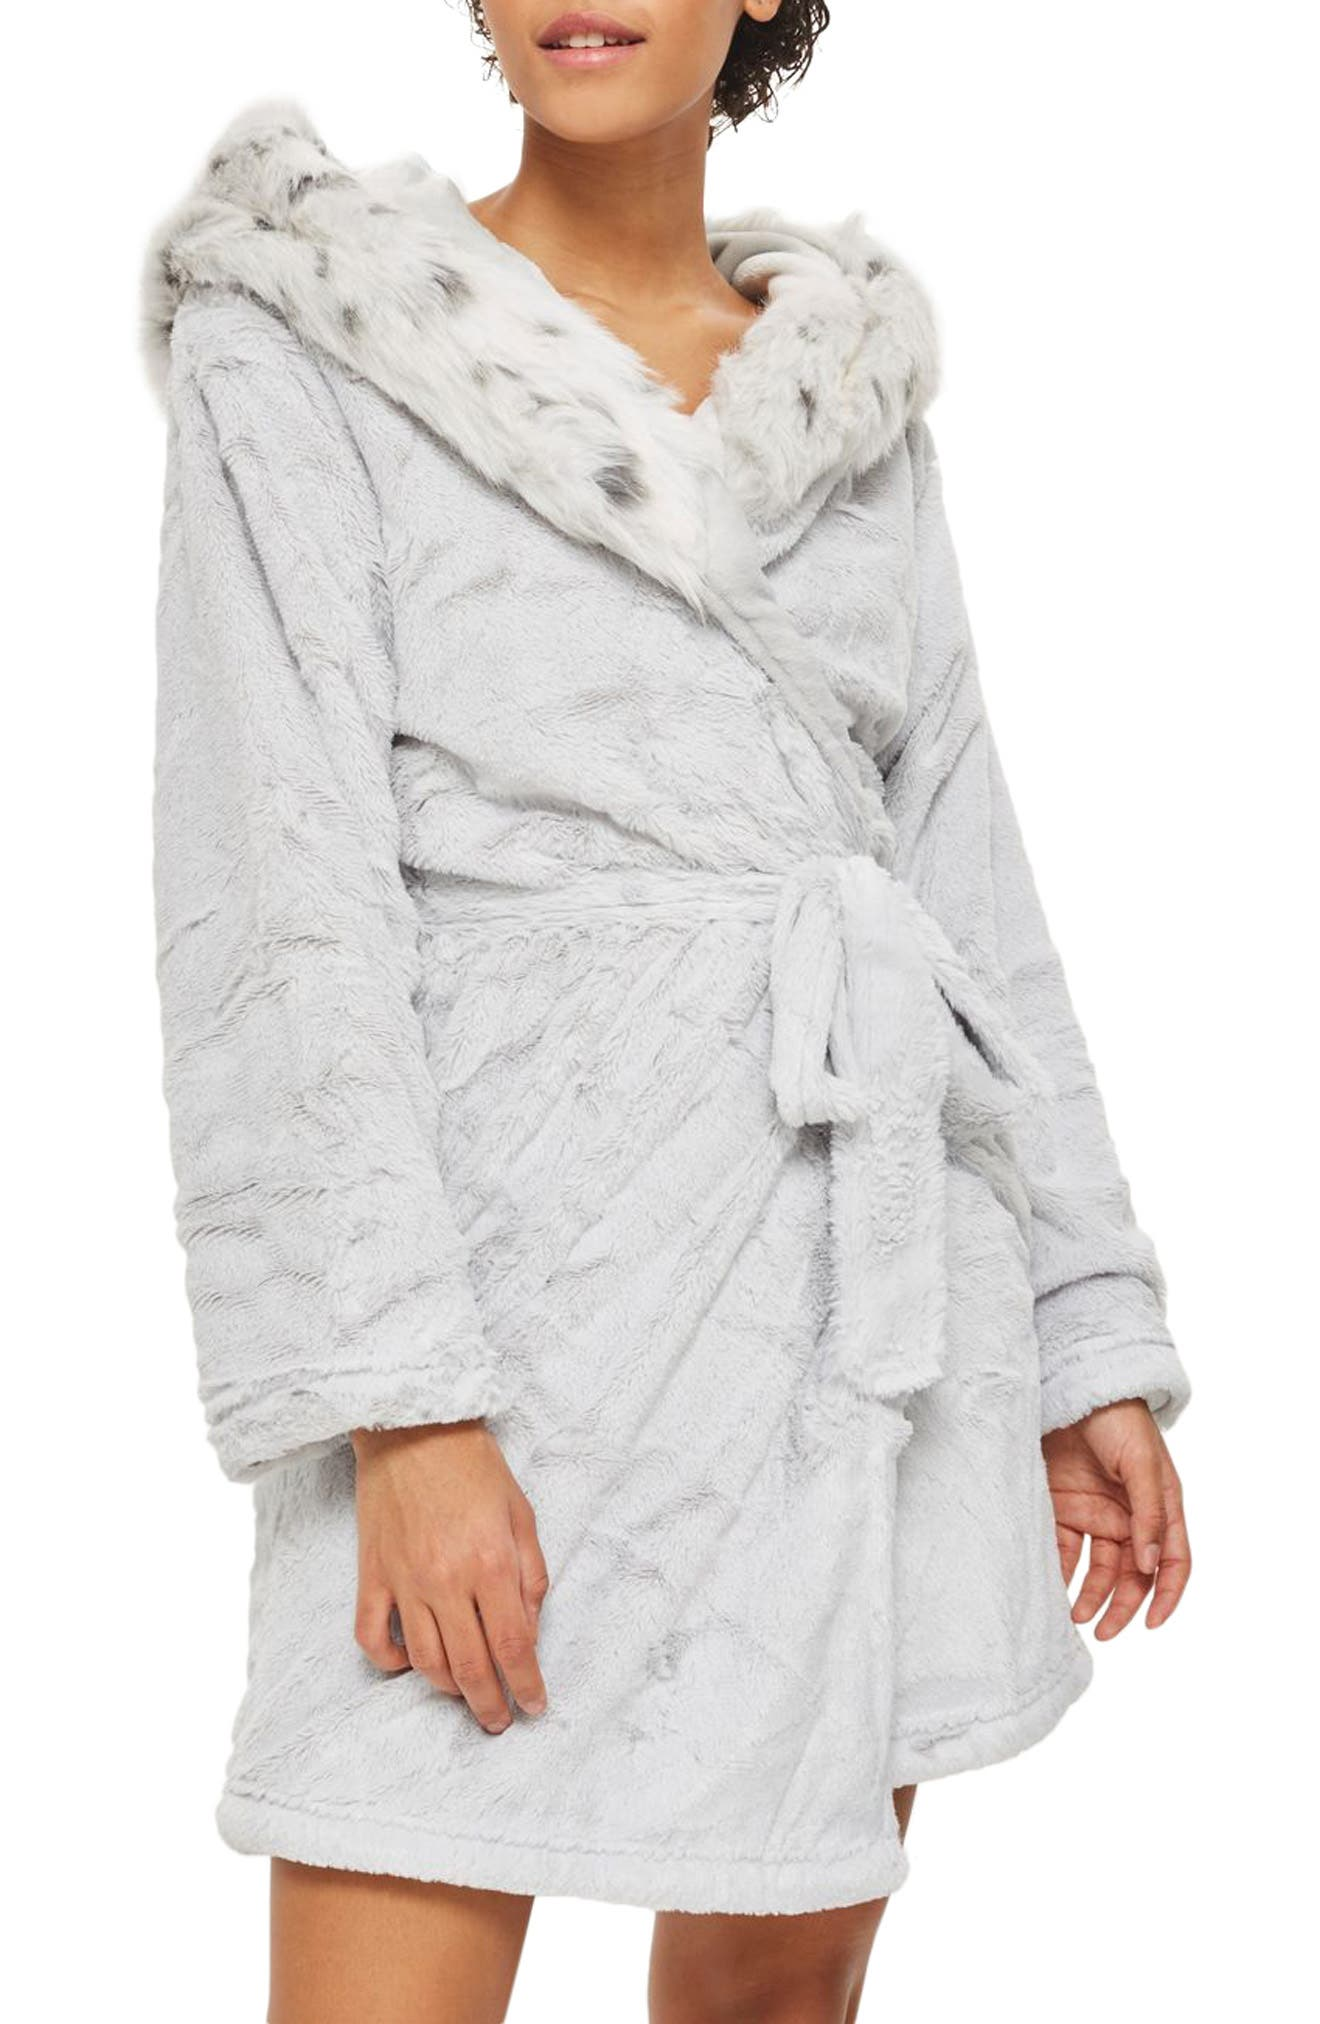 Faux Fur Hooded Short Robe,                             Main thumbnail 1, color,                             020